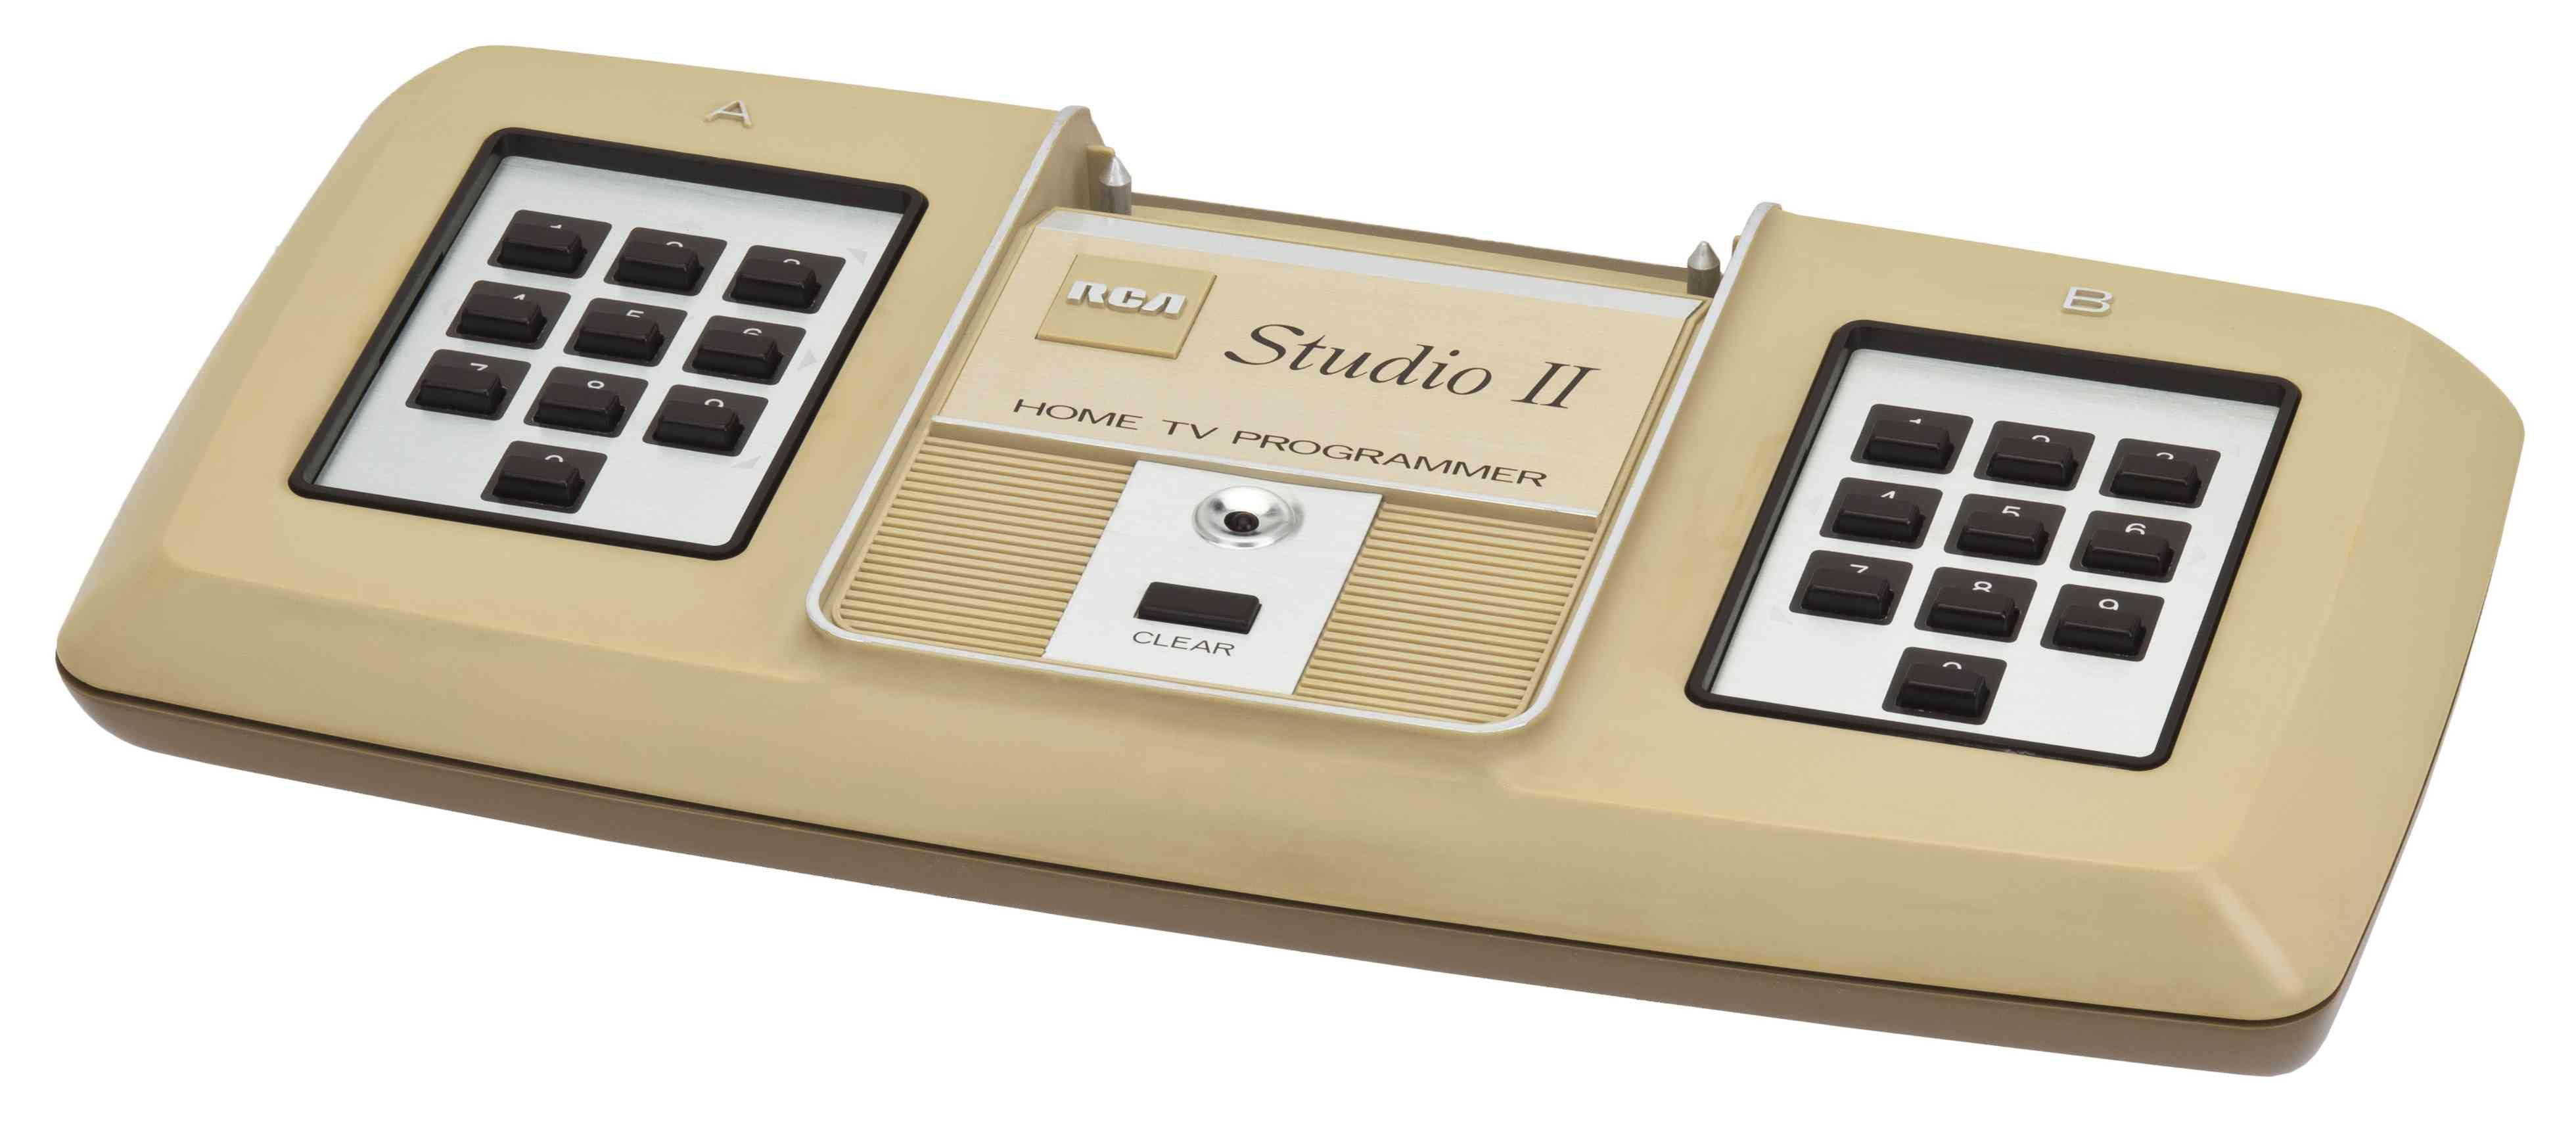 RCA Studio II